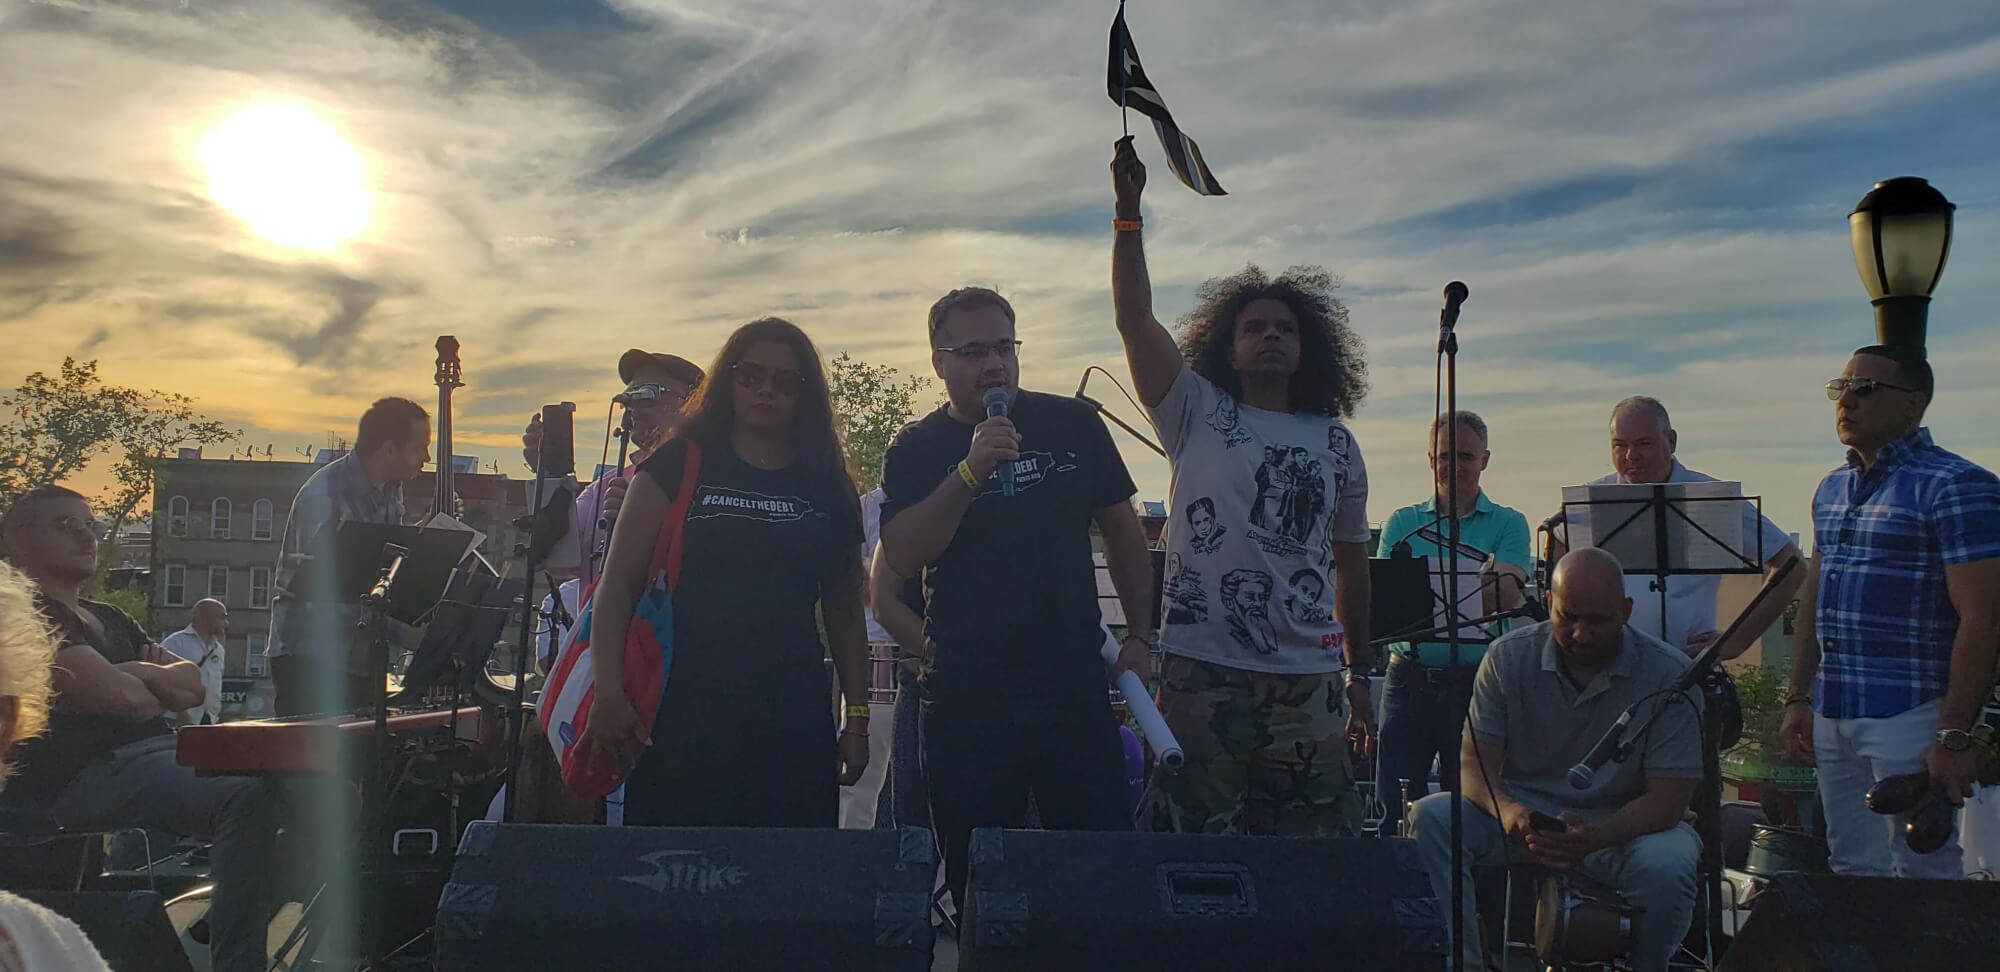 El Grito de Sunset Park Parade & Festival Brooklyn, New York, June 2019. Photo taken by Melinda González.